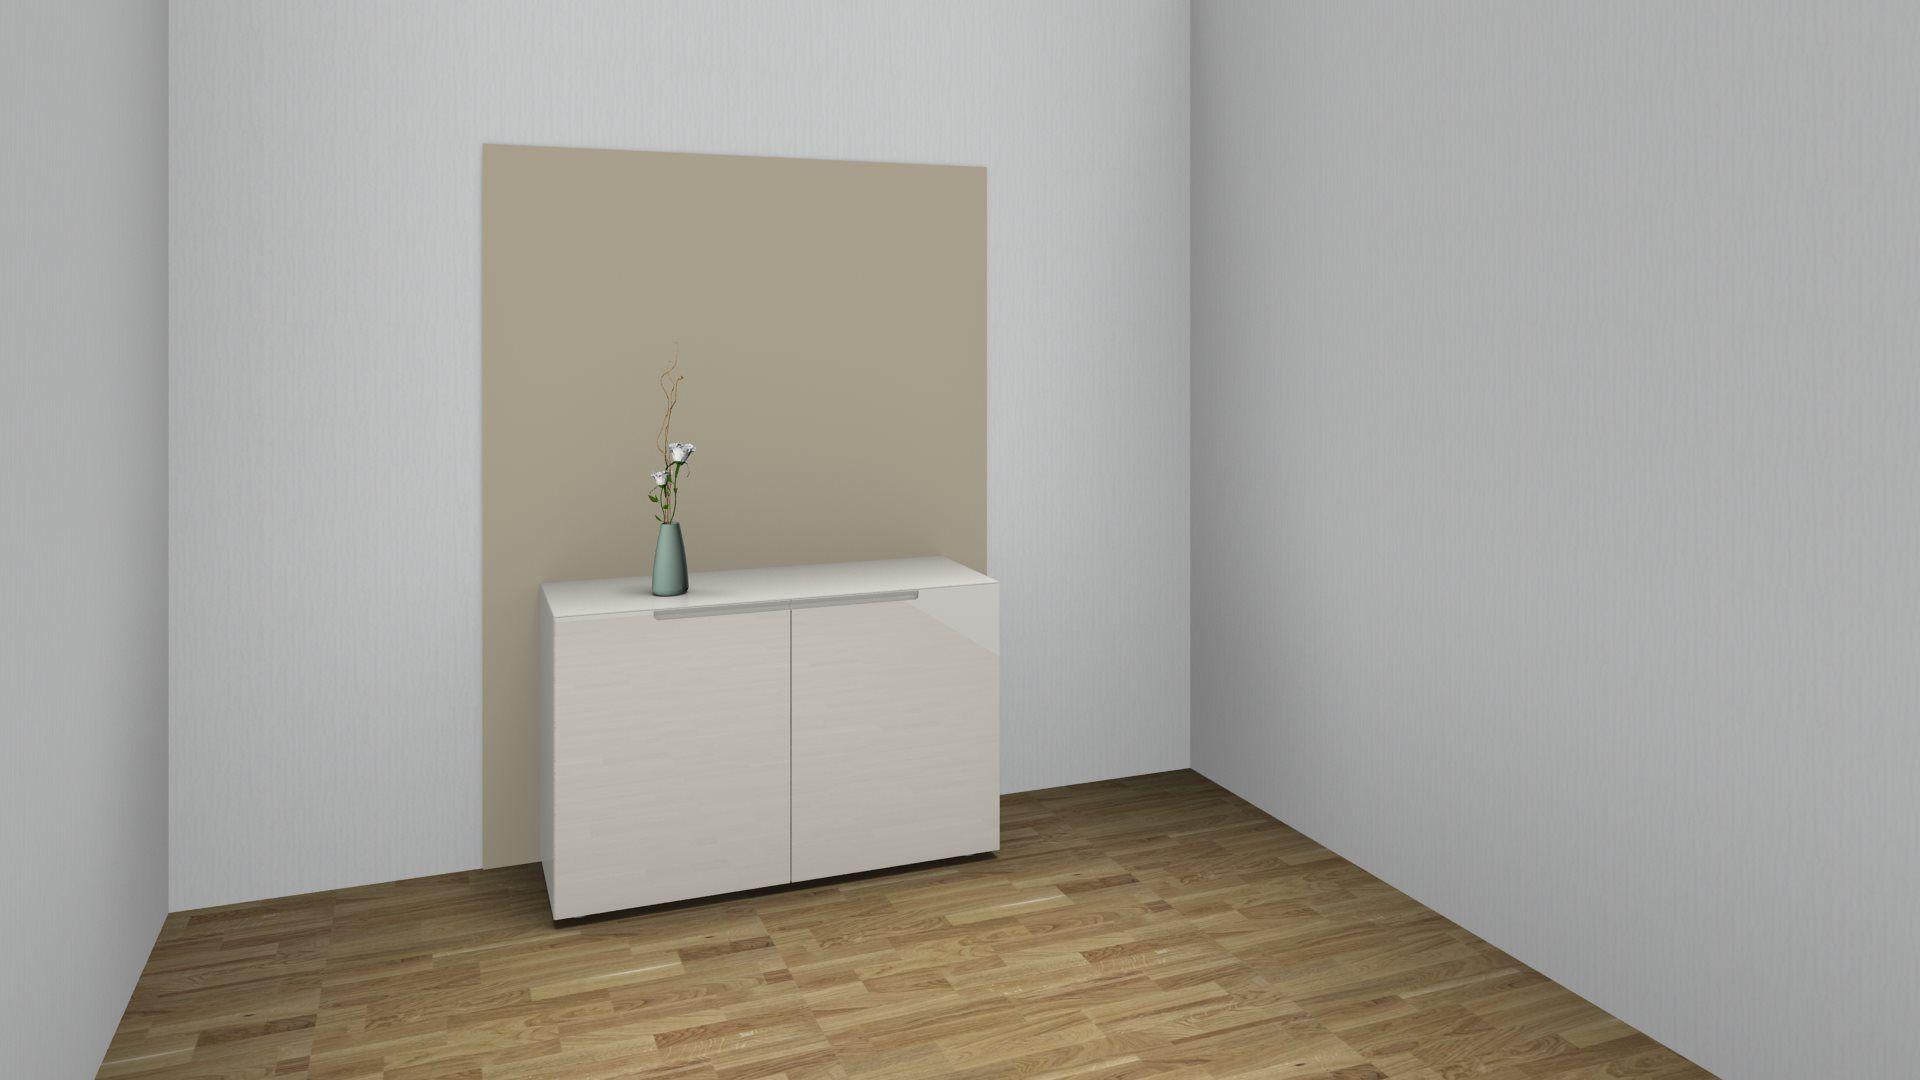 Mell Sideboard With 2 Doors W 120 Cm Interlubke Interluebke U6263